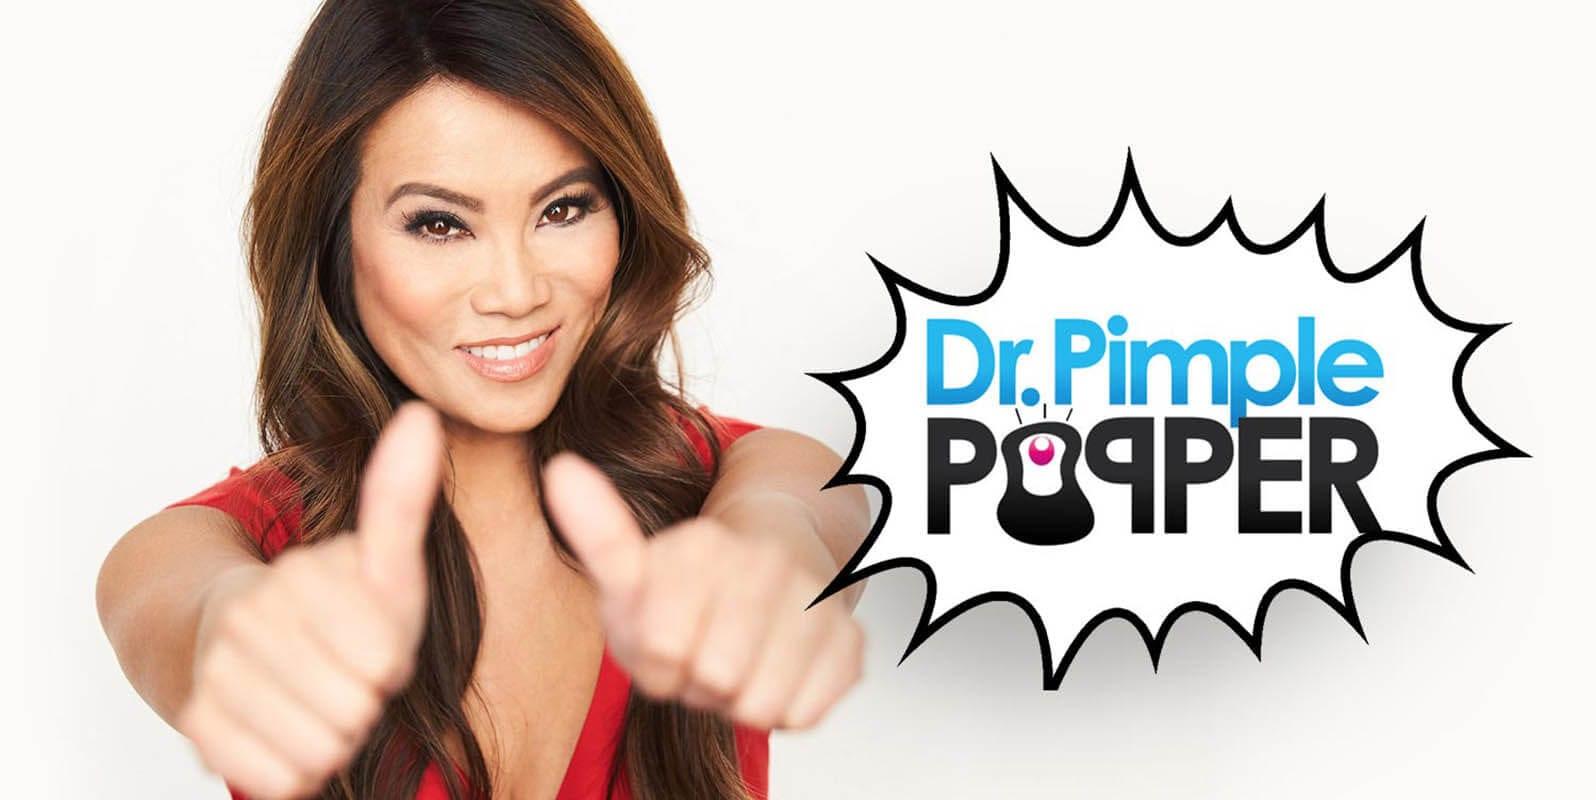 Meet Dr  Pimple Popper - Upland, CA | Skin Physicians & Surgeons